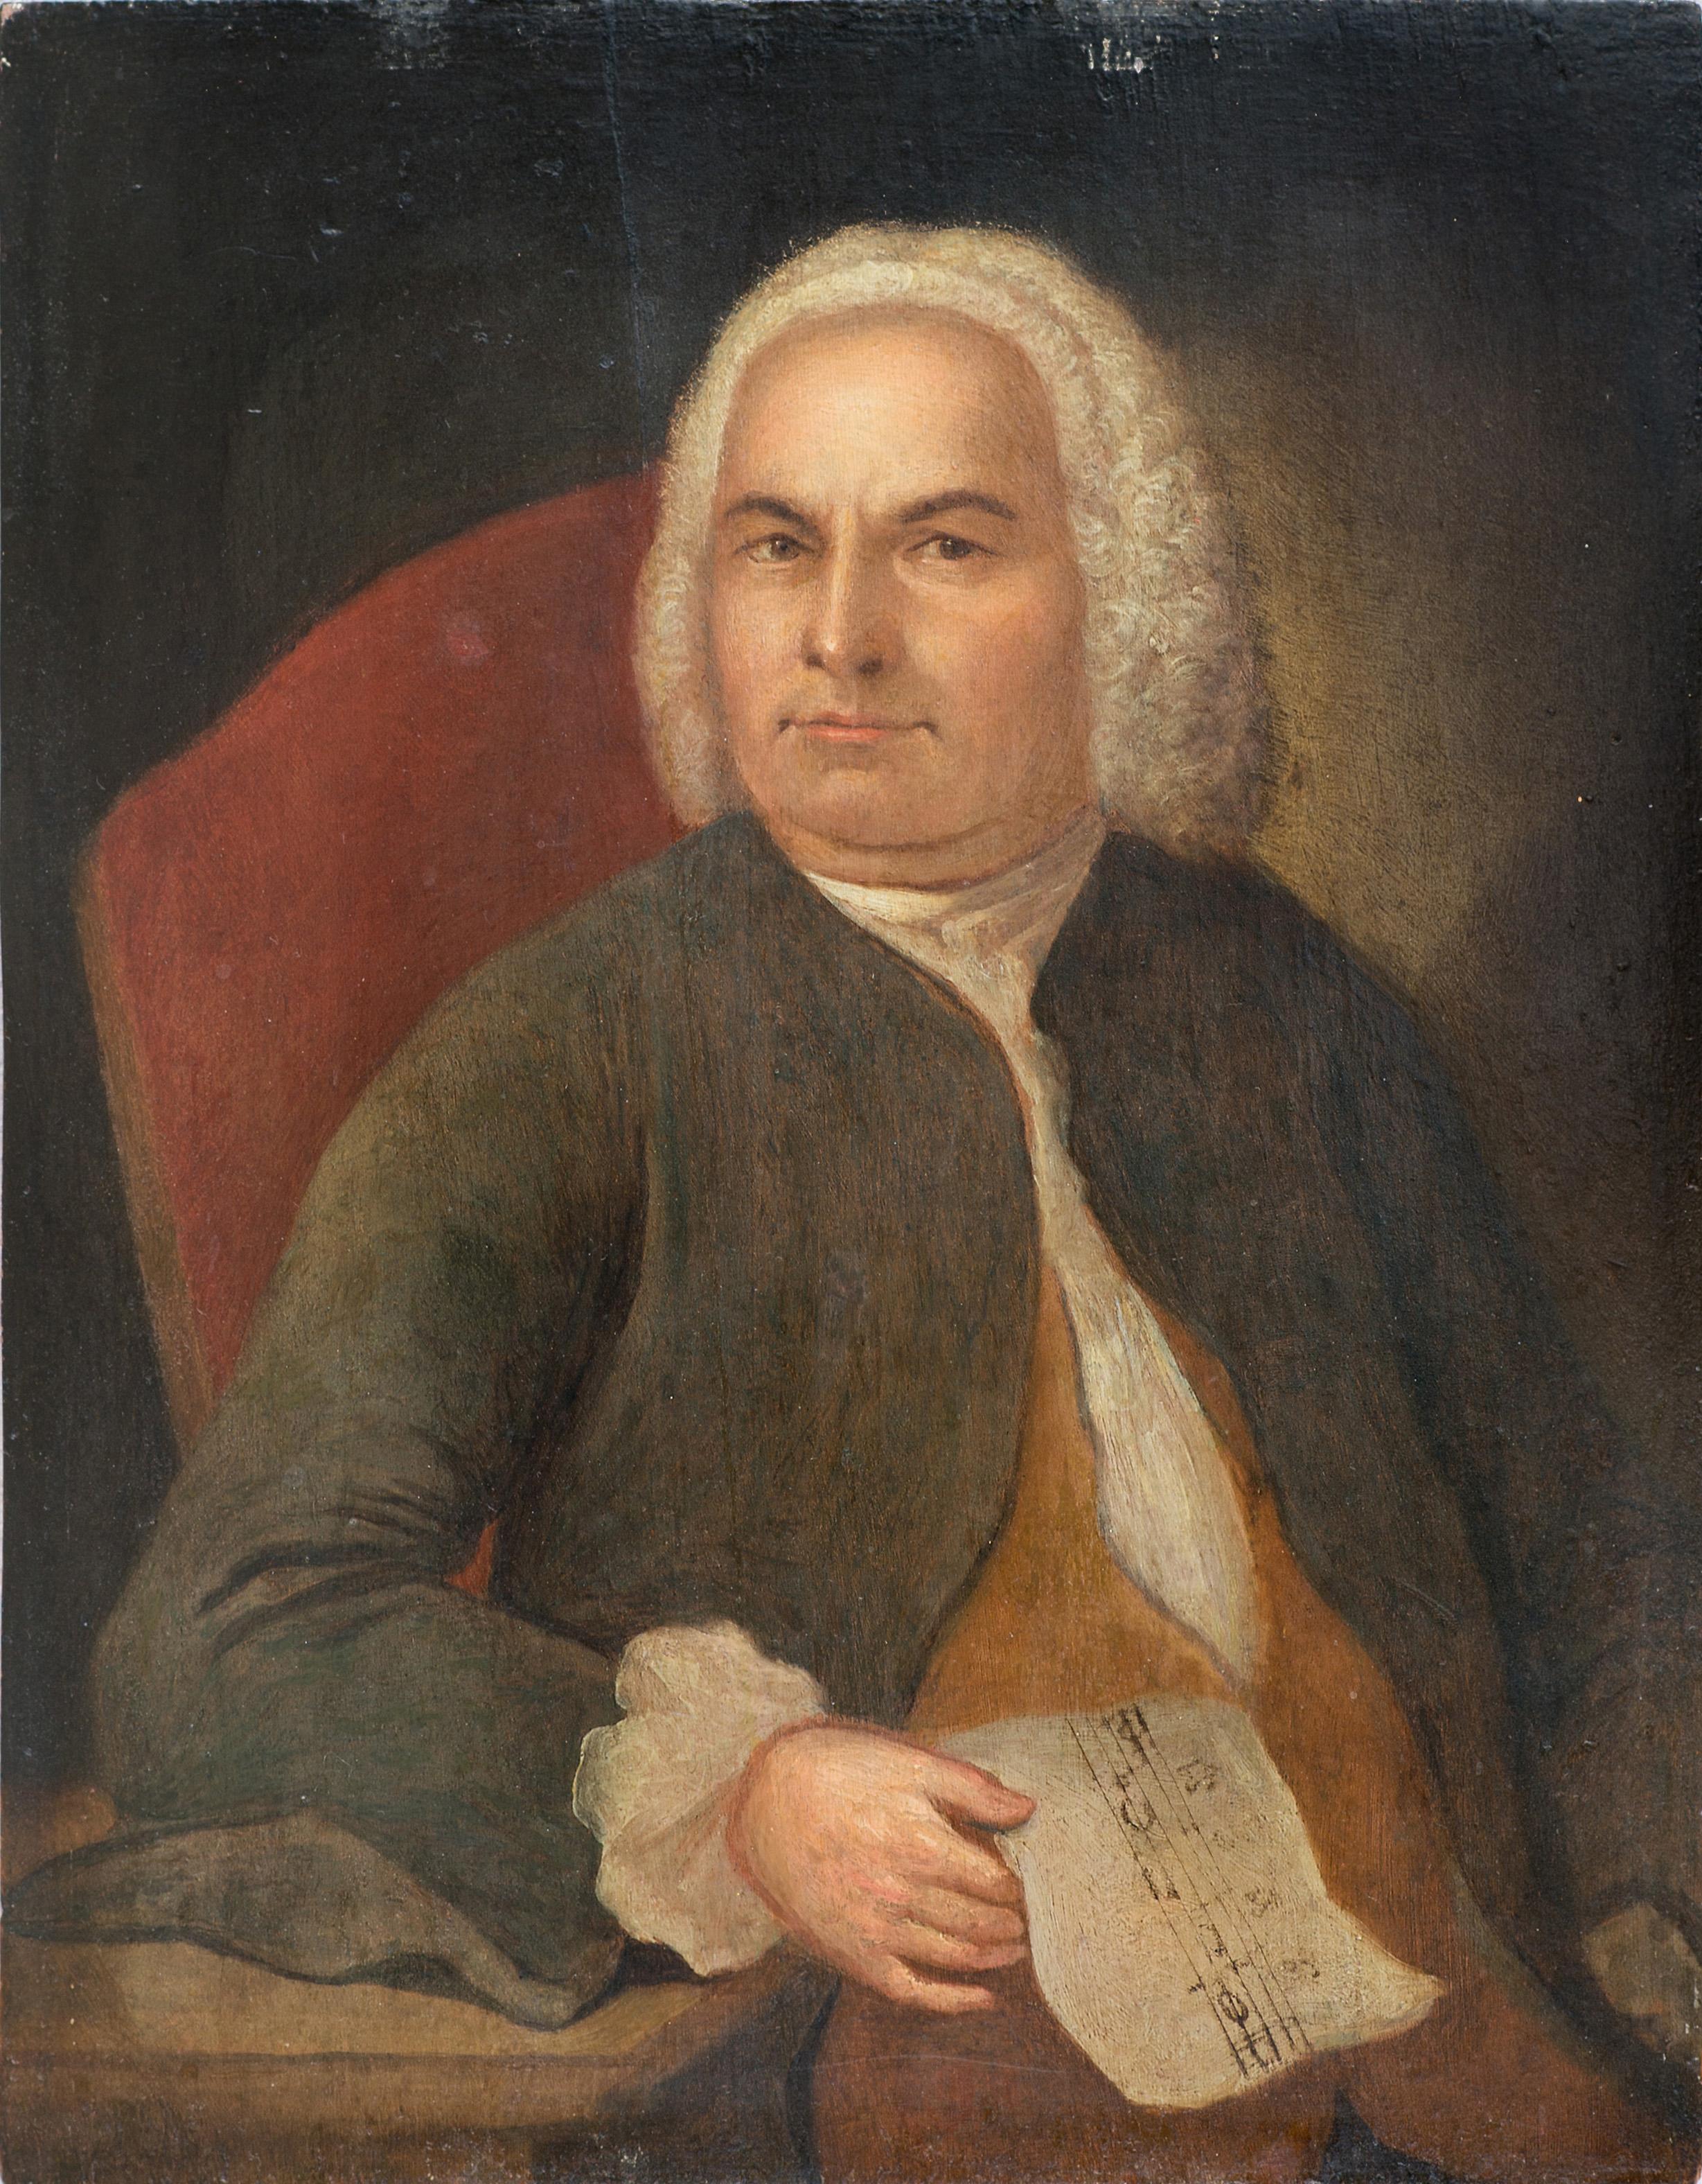 Johann Emanuel Göbel Bach portrait